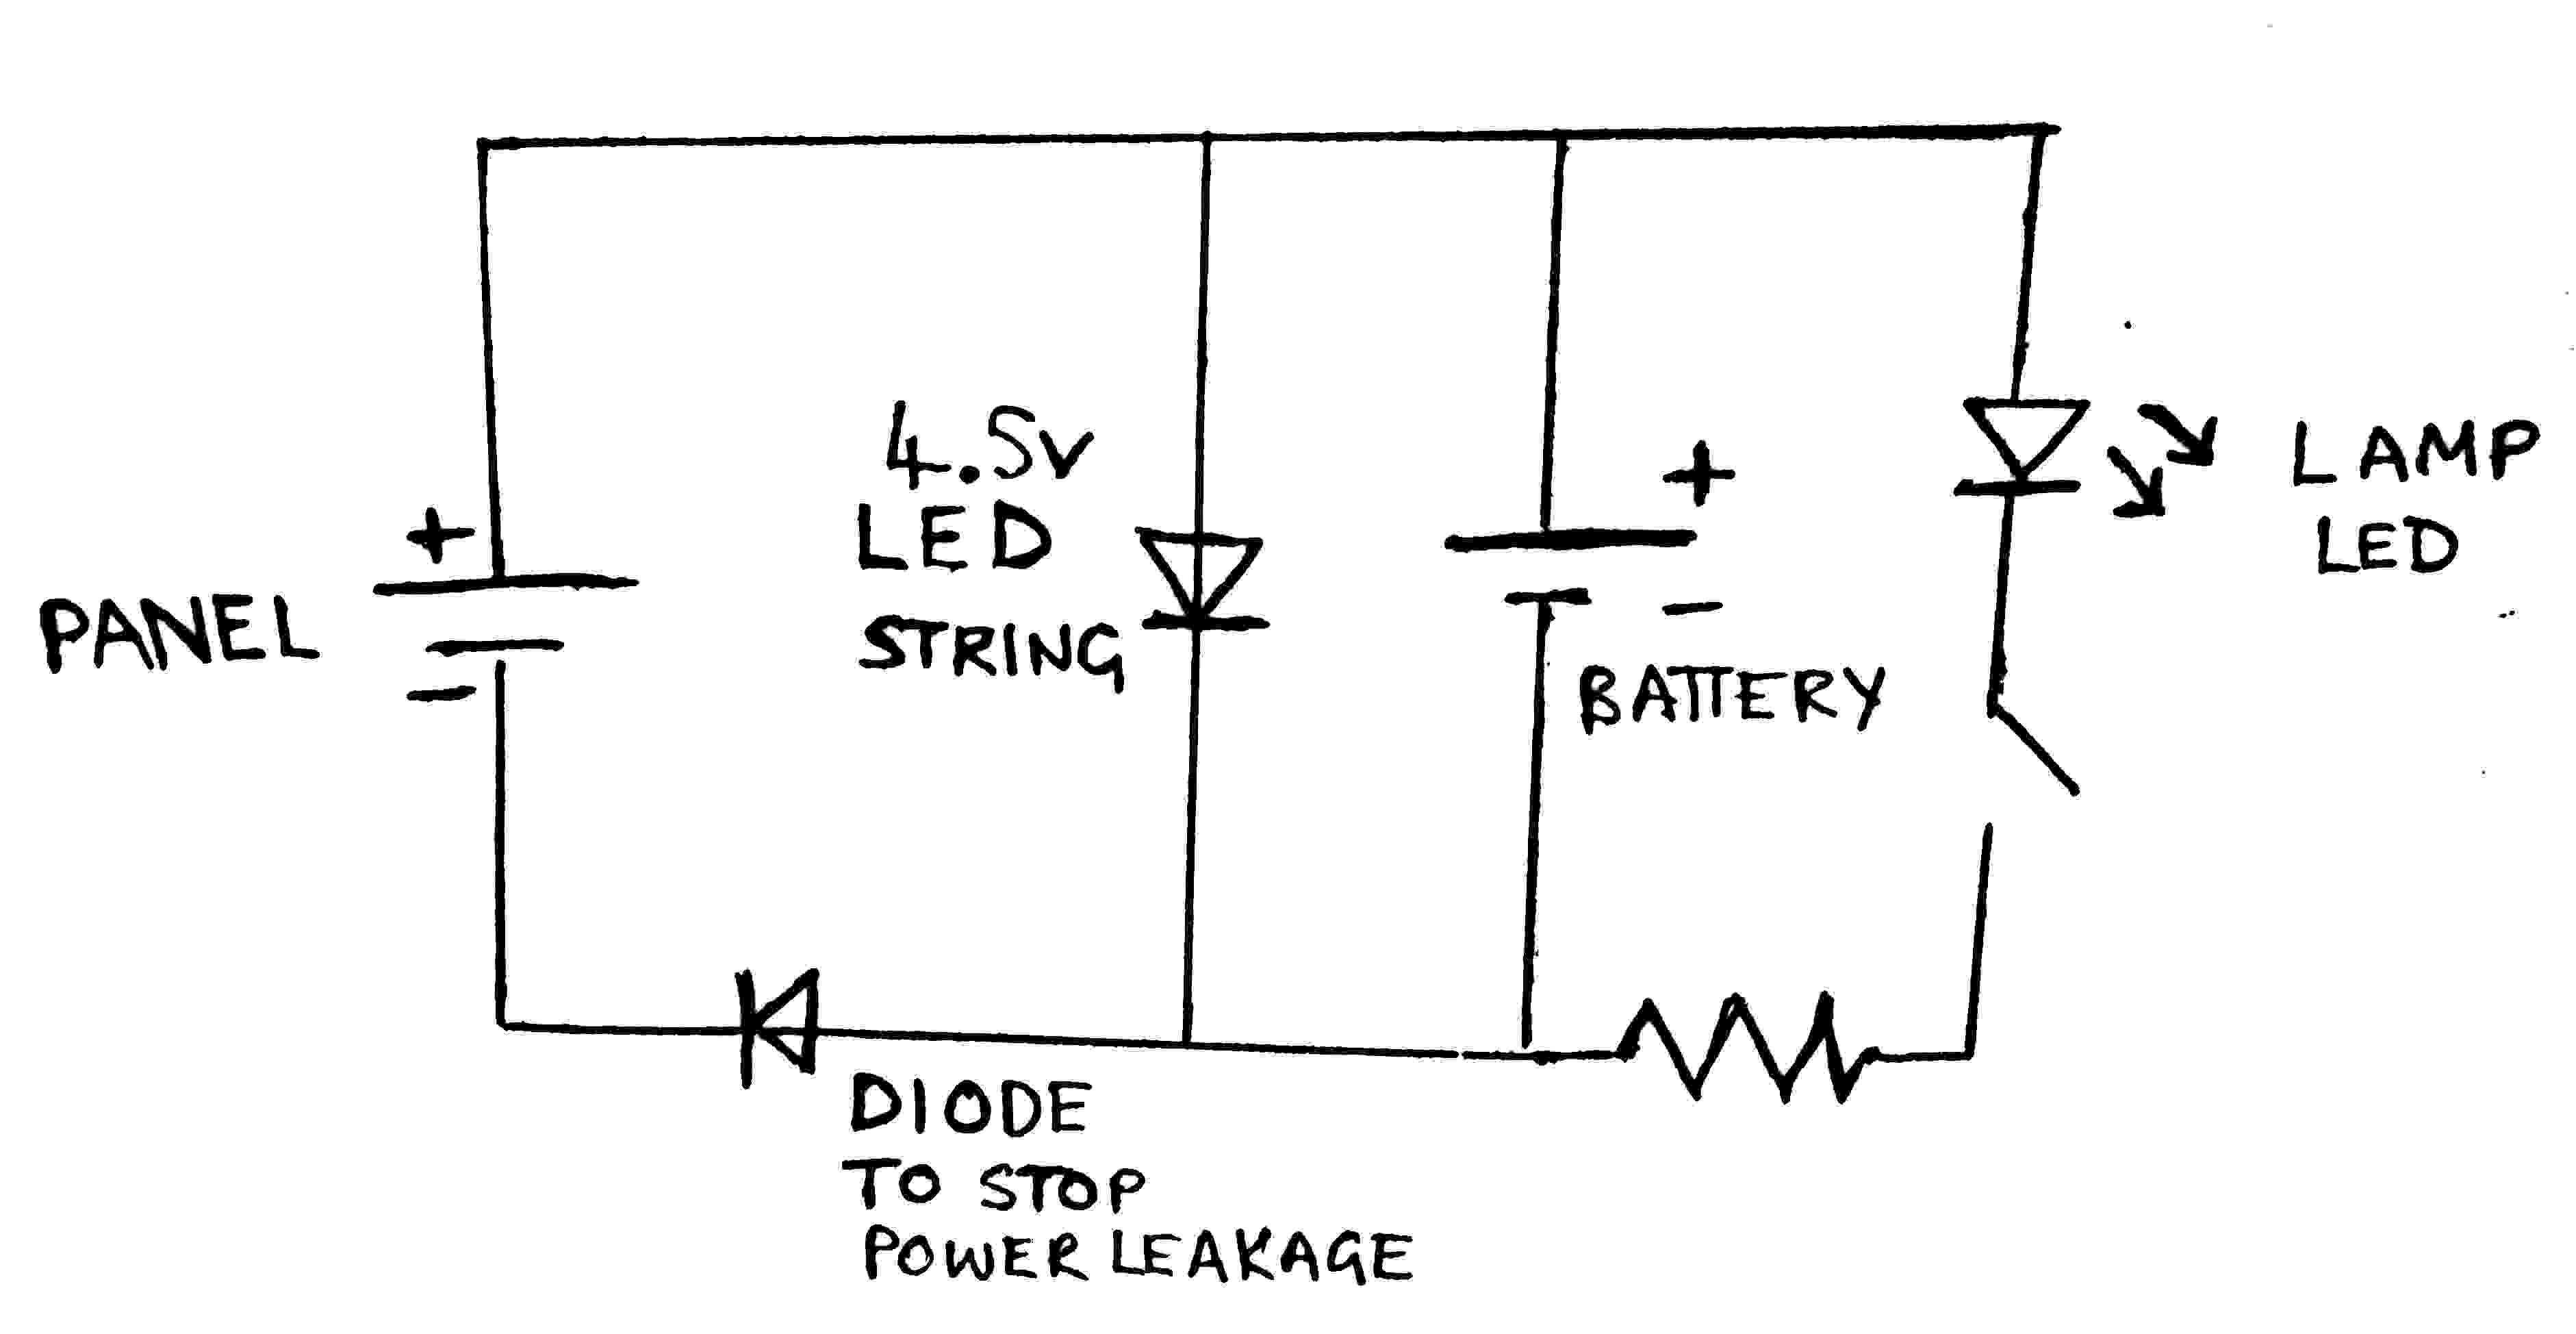 medium resolution of 120v led wiring diagram wiring diagram blogs wiring diagram 120v led string lighting 120v led wiring diagram